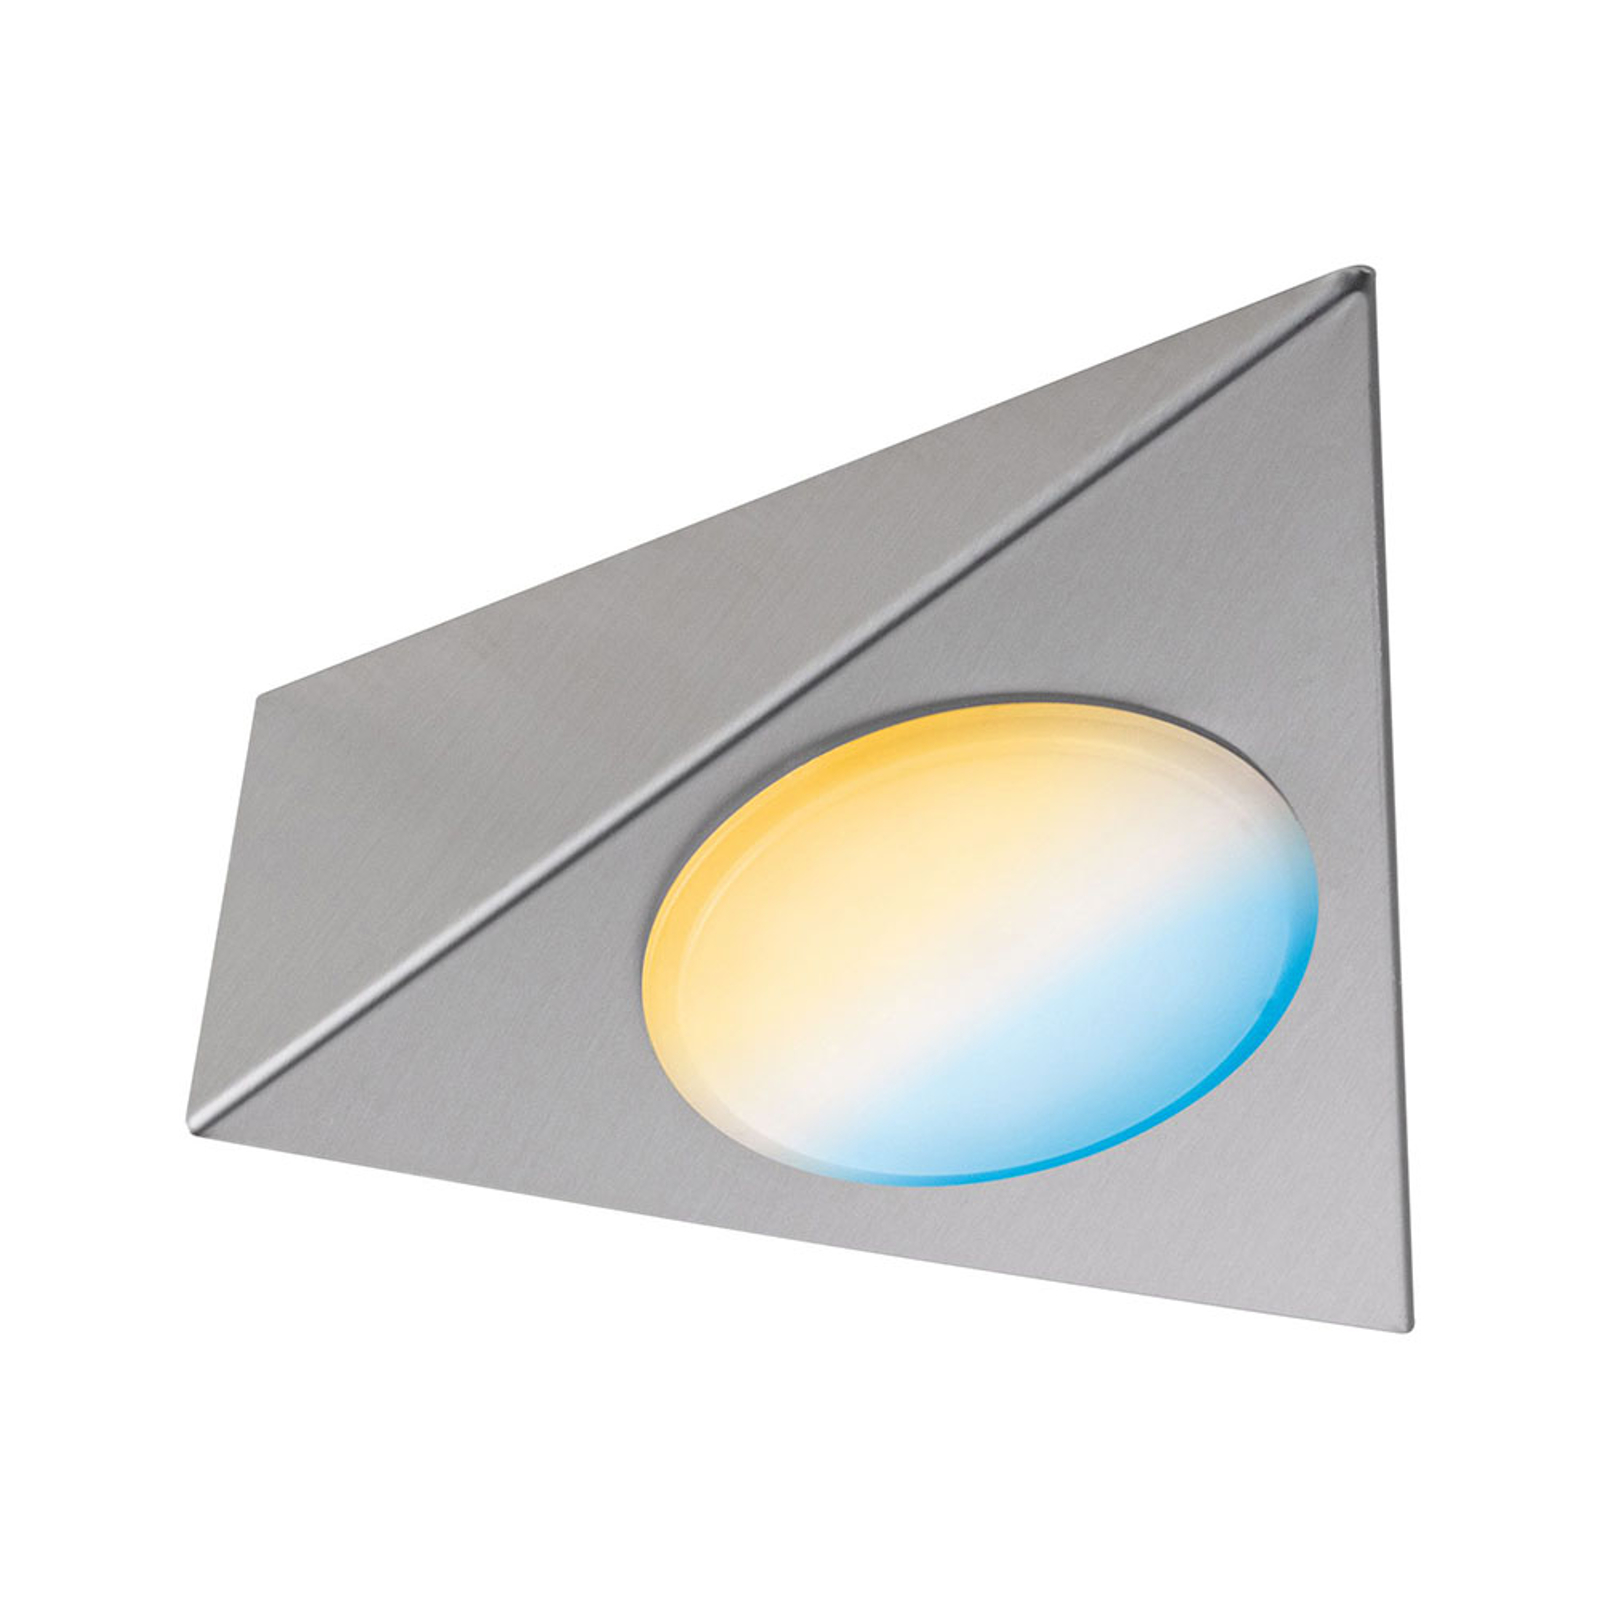 Paulmann Clever Connect Trigo lampa mebli nikiel